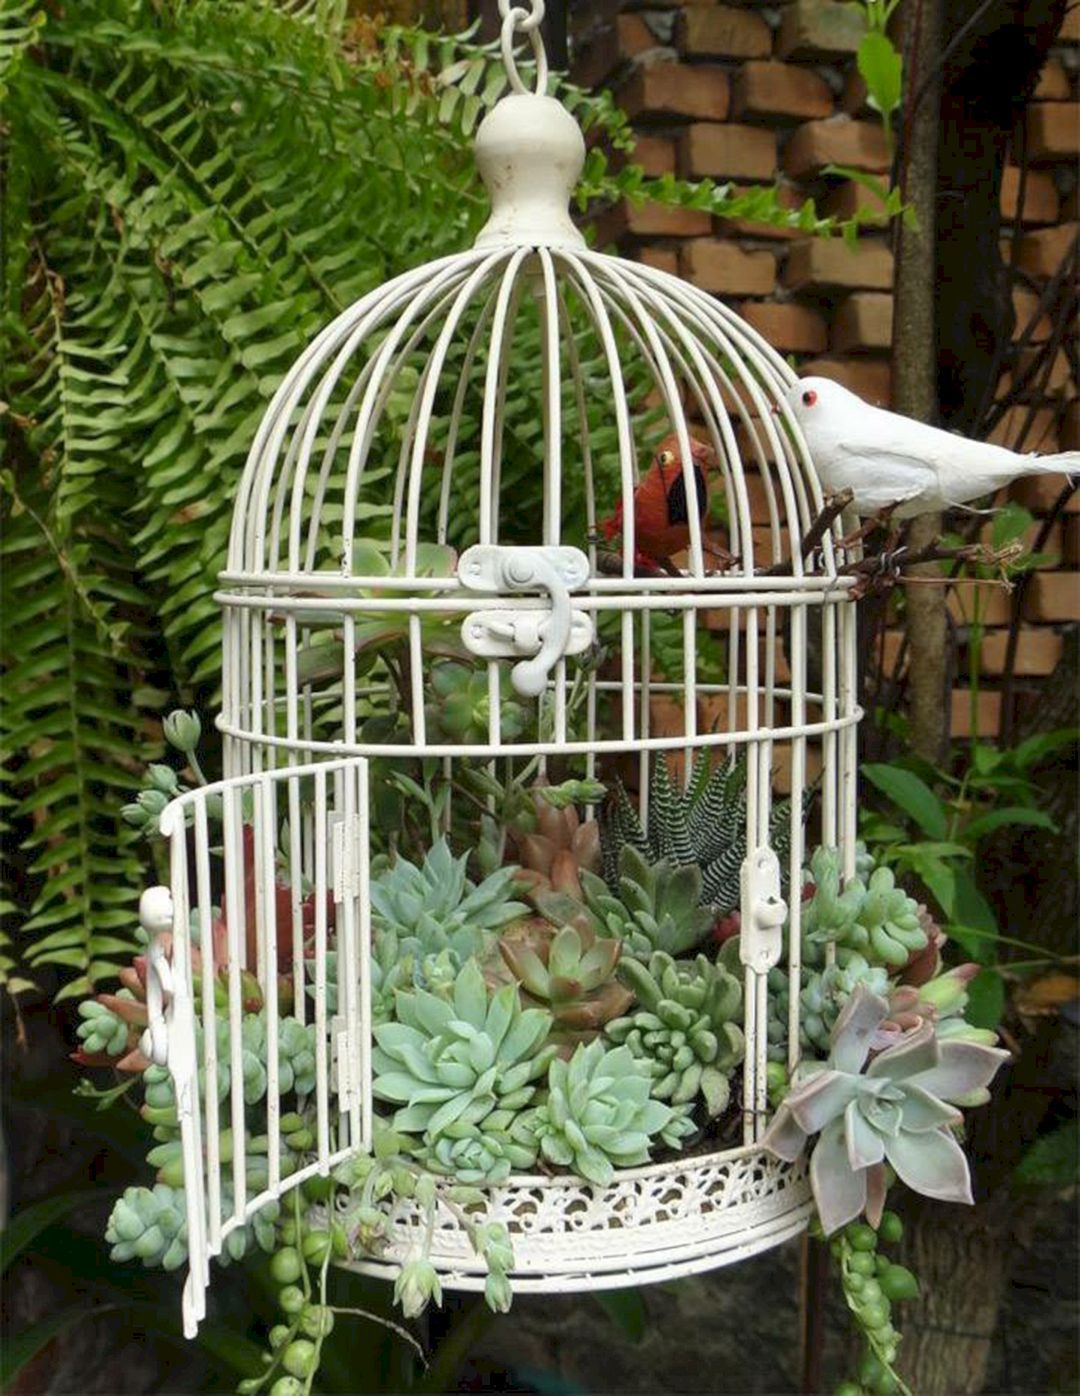 Awesome Container Garden with Succulents: 45+ Best Design Ideas / FresHOUZ.com #gardendesign